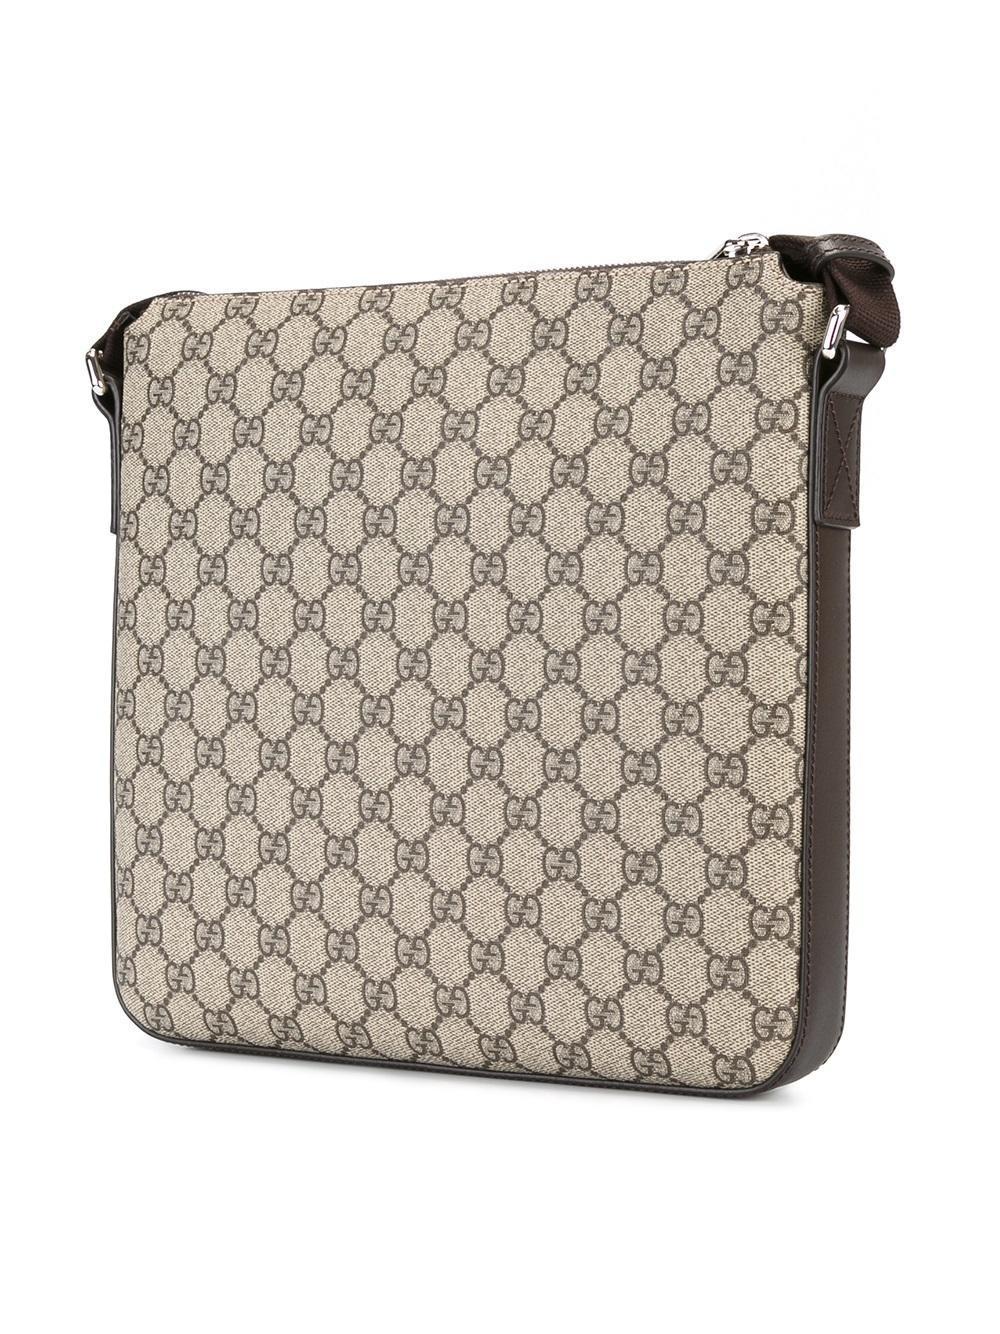 98528249c801e Gucci Gg Supreme Messenger Bag for Men